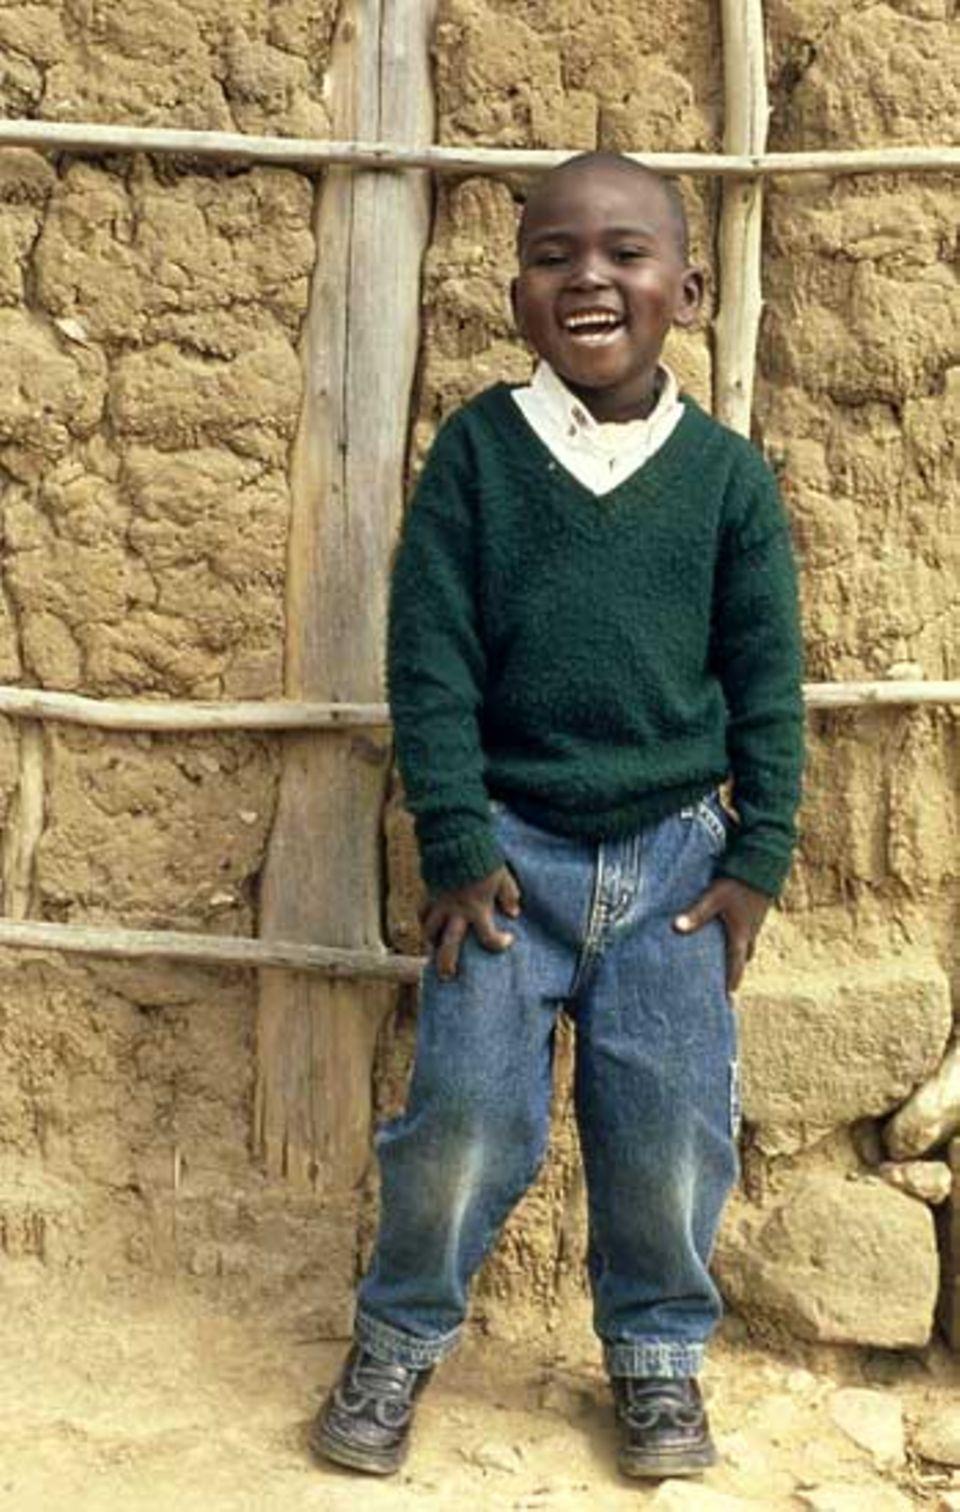 Francis Mutia David, geboren am 5. November 1998 in Musalala, Kenya